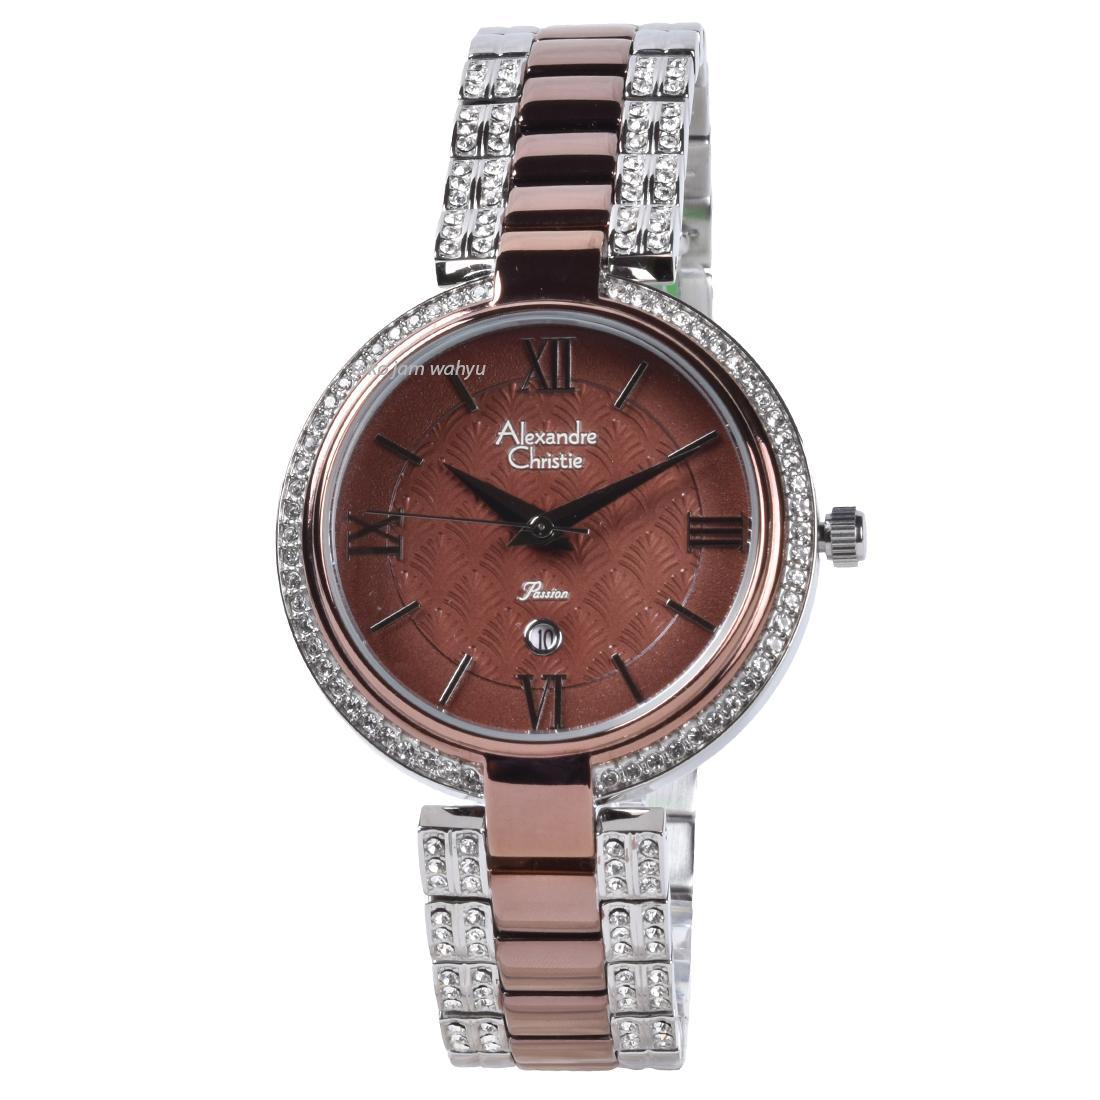 Alexandre Christie 2739 Jam Tangan Wanita - Silver Brown - Stainless Steel